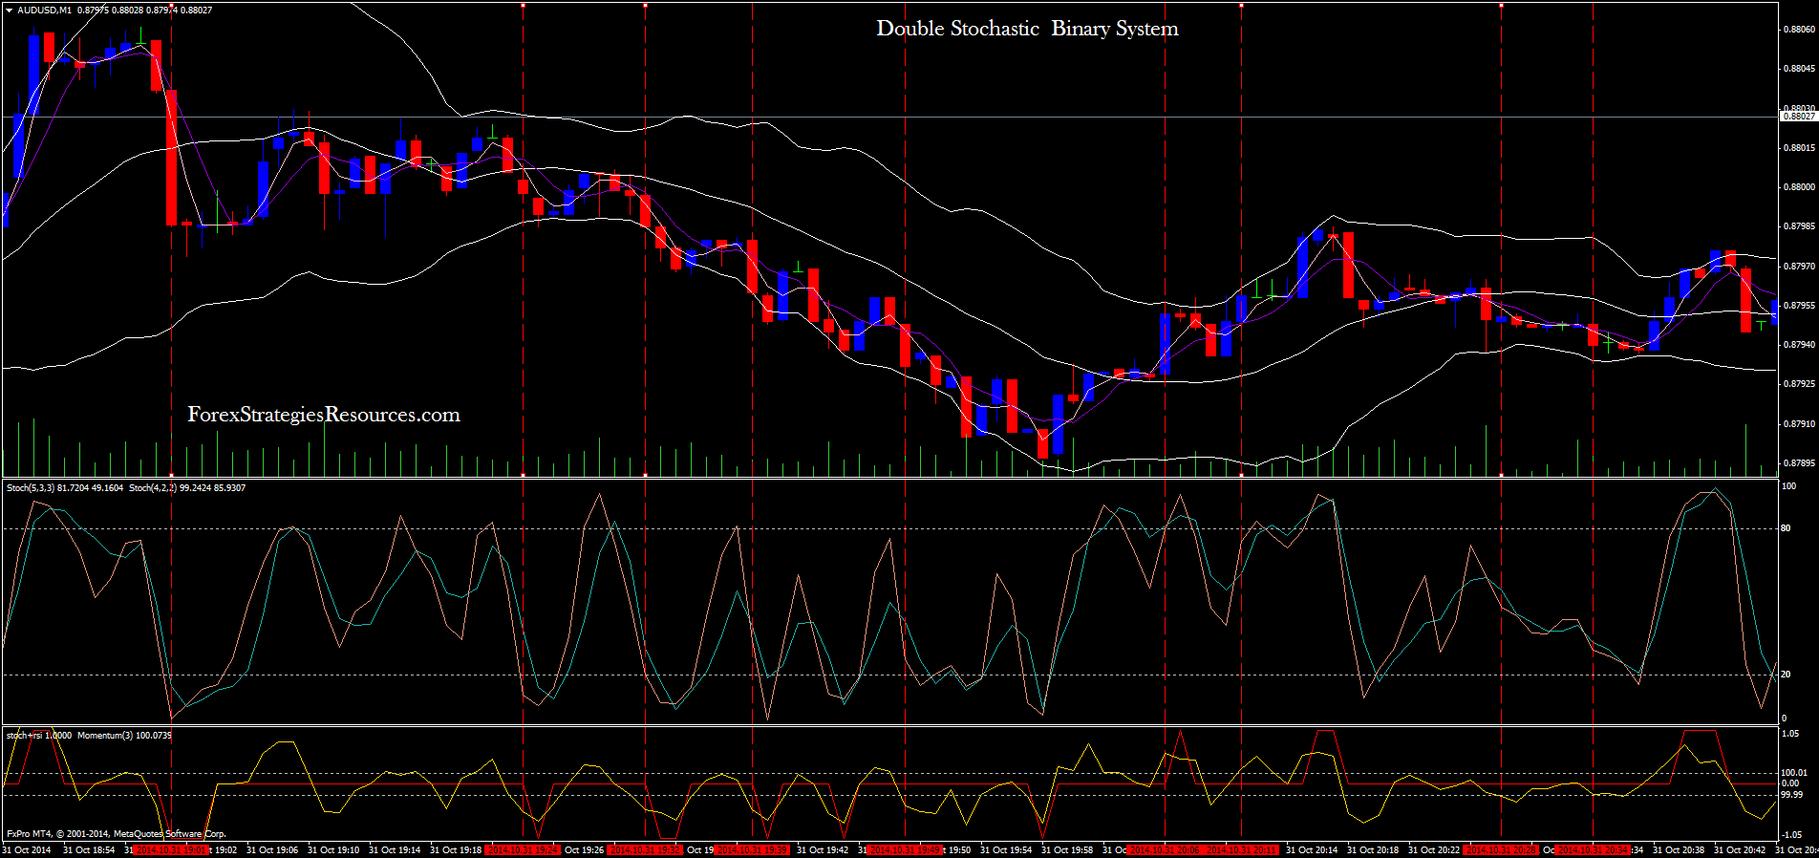 Manfaat Divergence Untuk Trading Binary Options